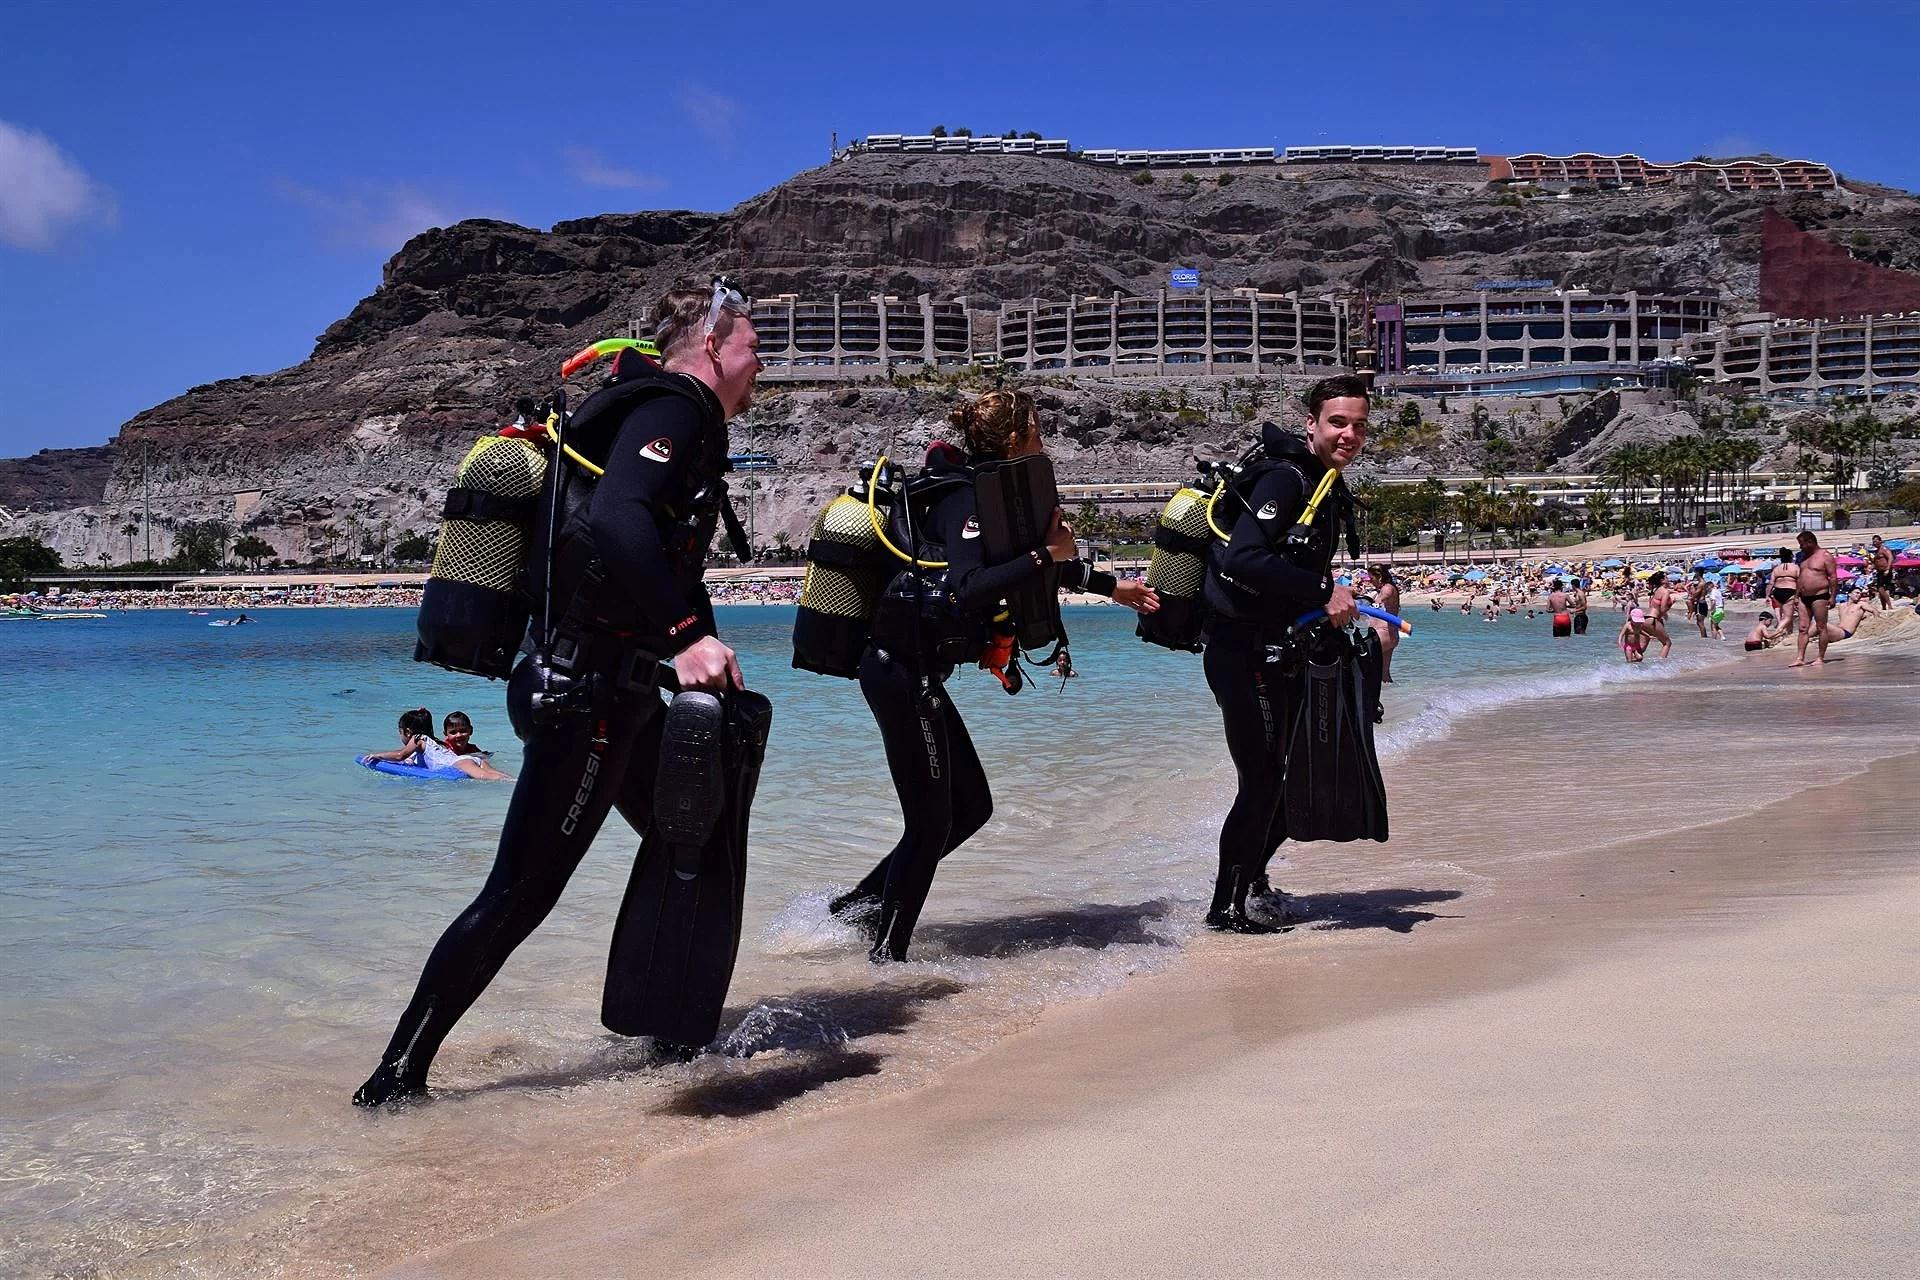 scuba diving på resan